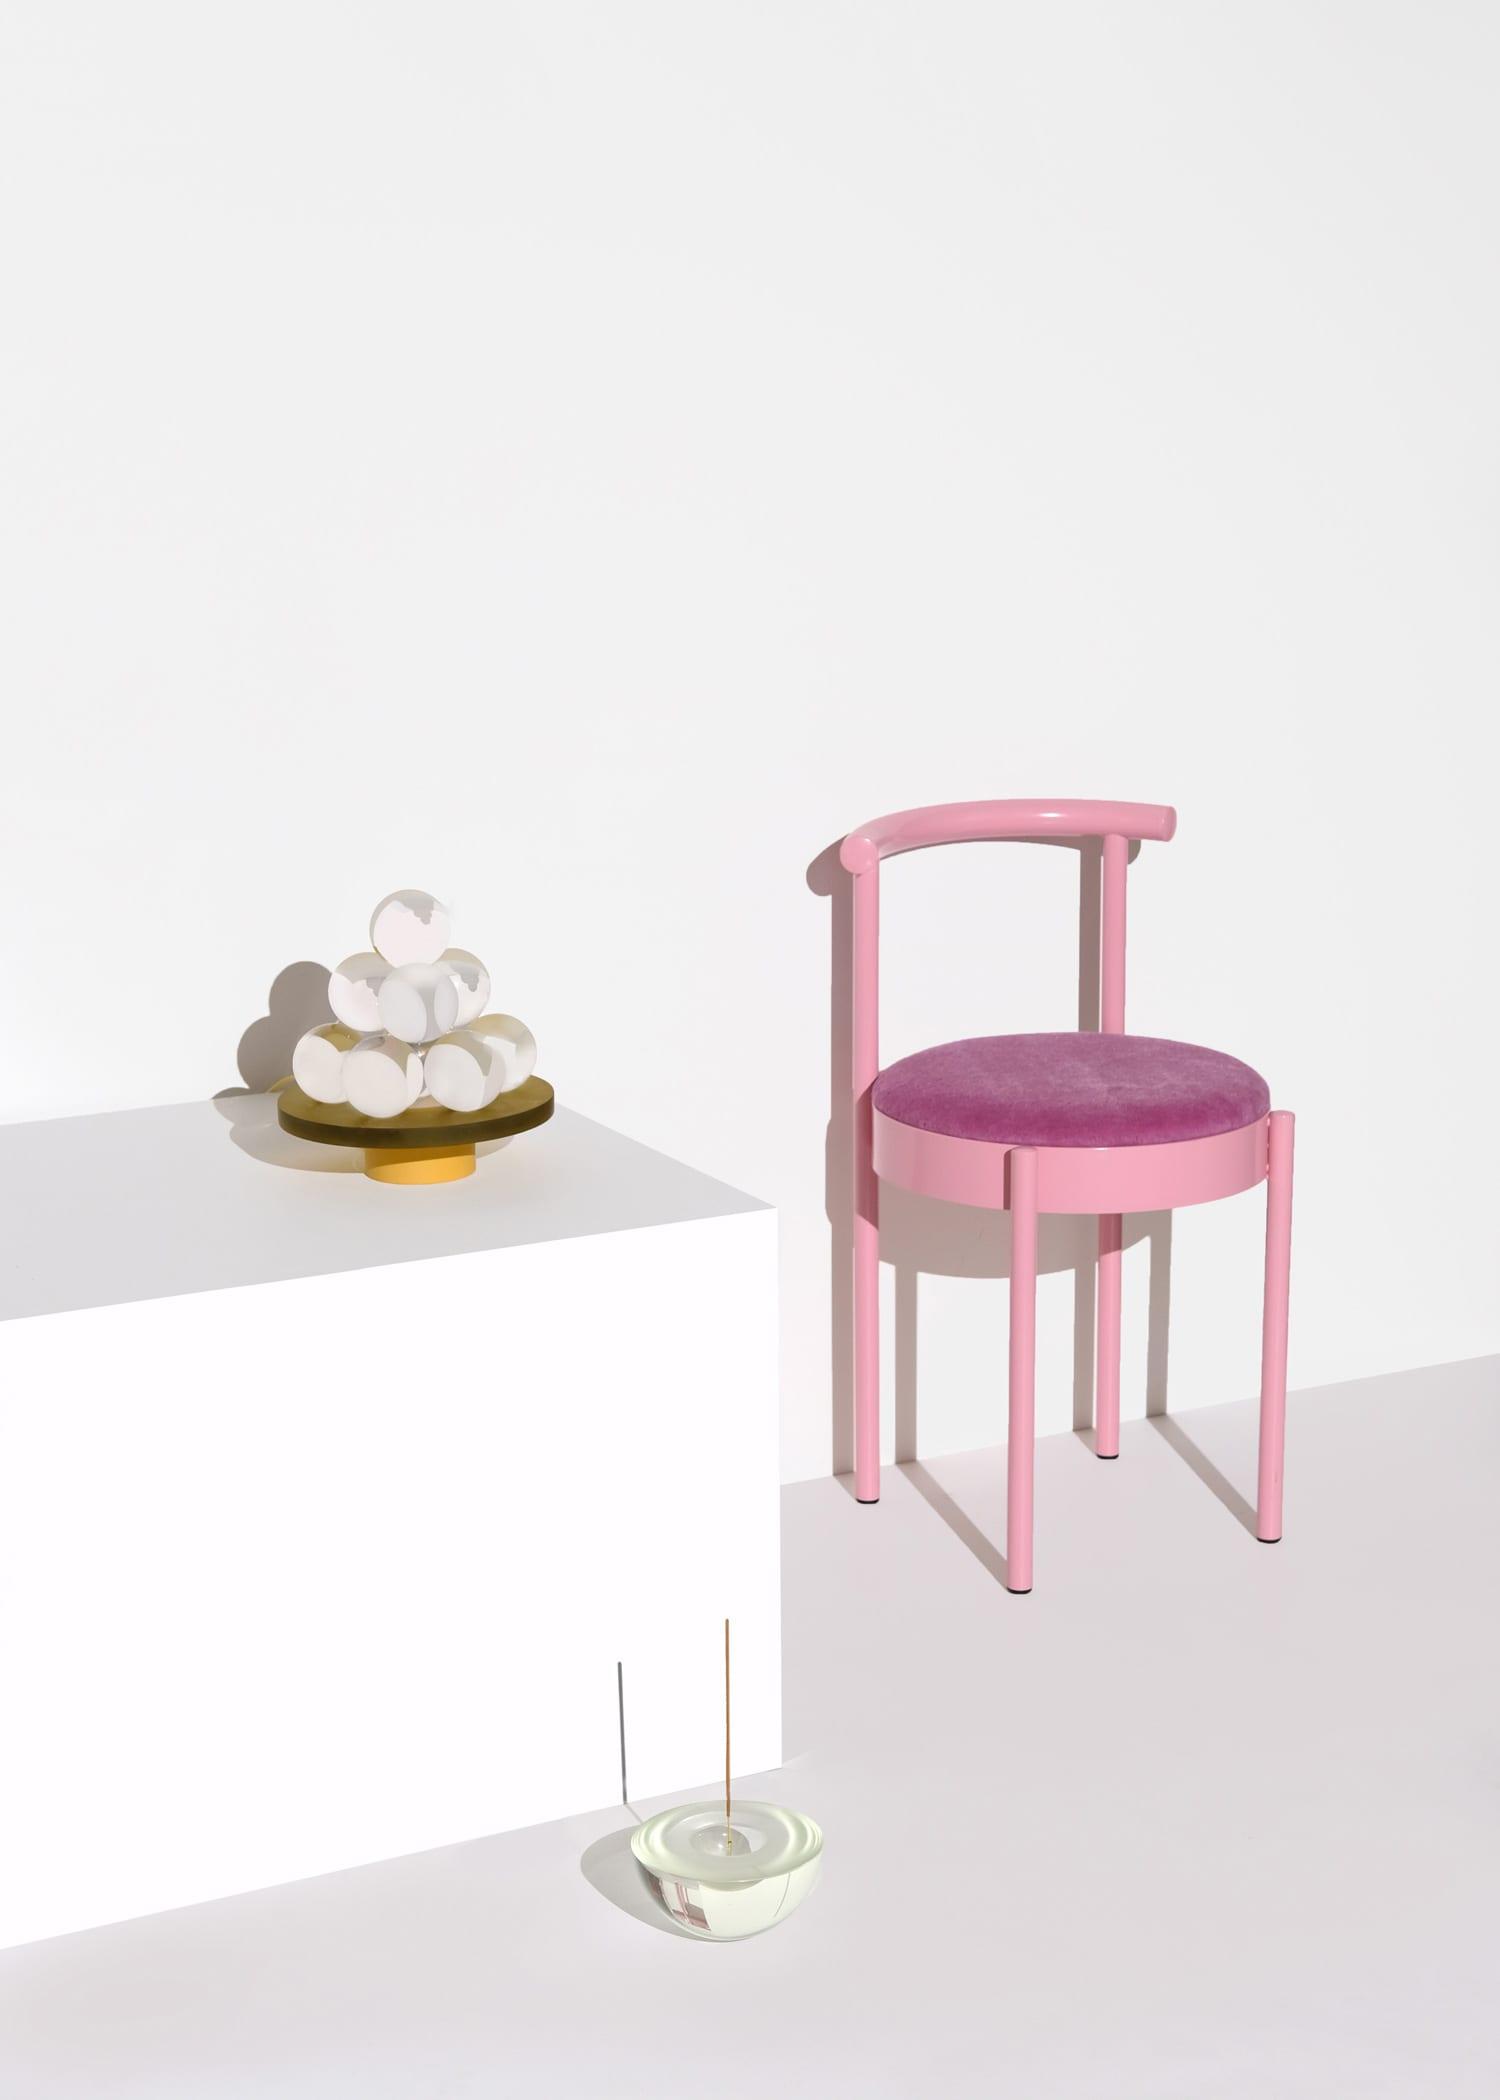 Australian Designers in Milan: Bling Bling Dynasty Collection byDaniel Emma | #Milantrace2018